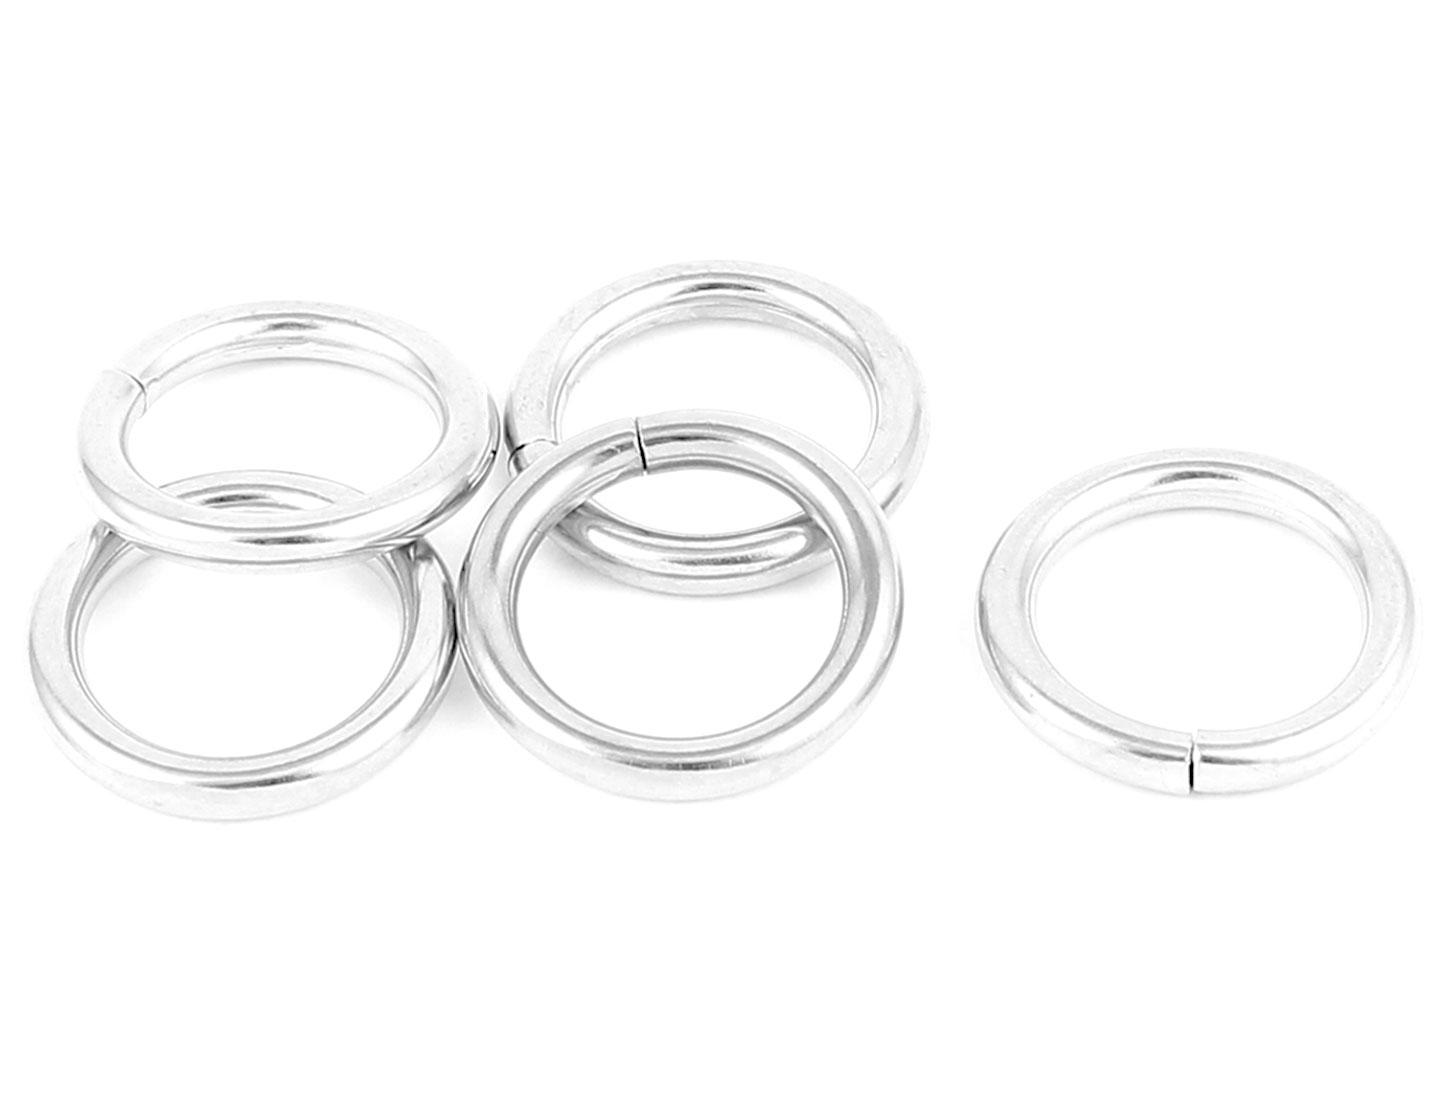 5pcs 2cm Inner Dia Silver Tone Metal Handbag Backpack Link Belt O Ring Decor Buckle